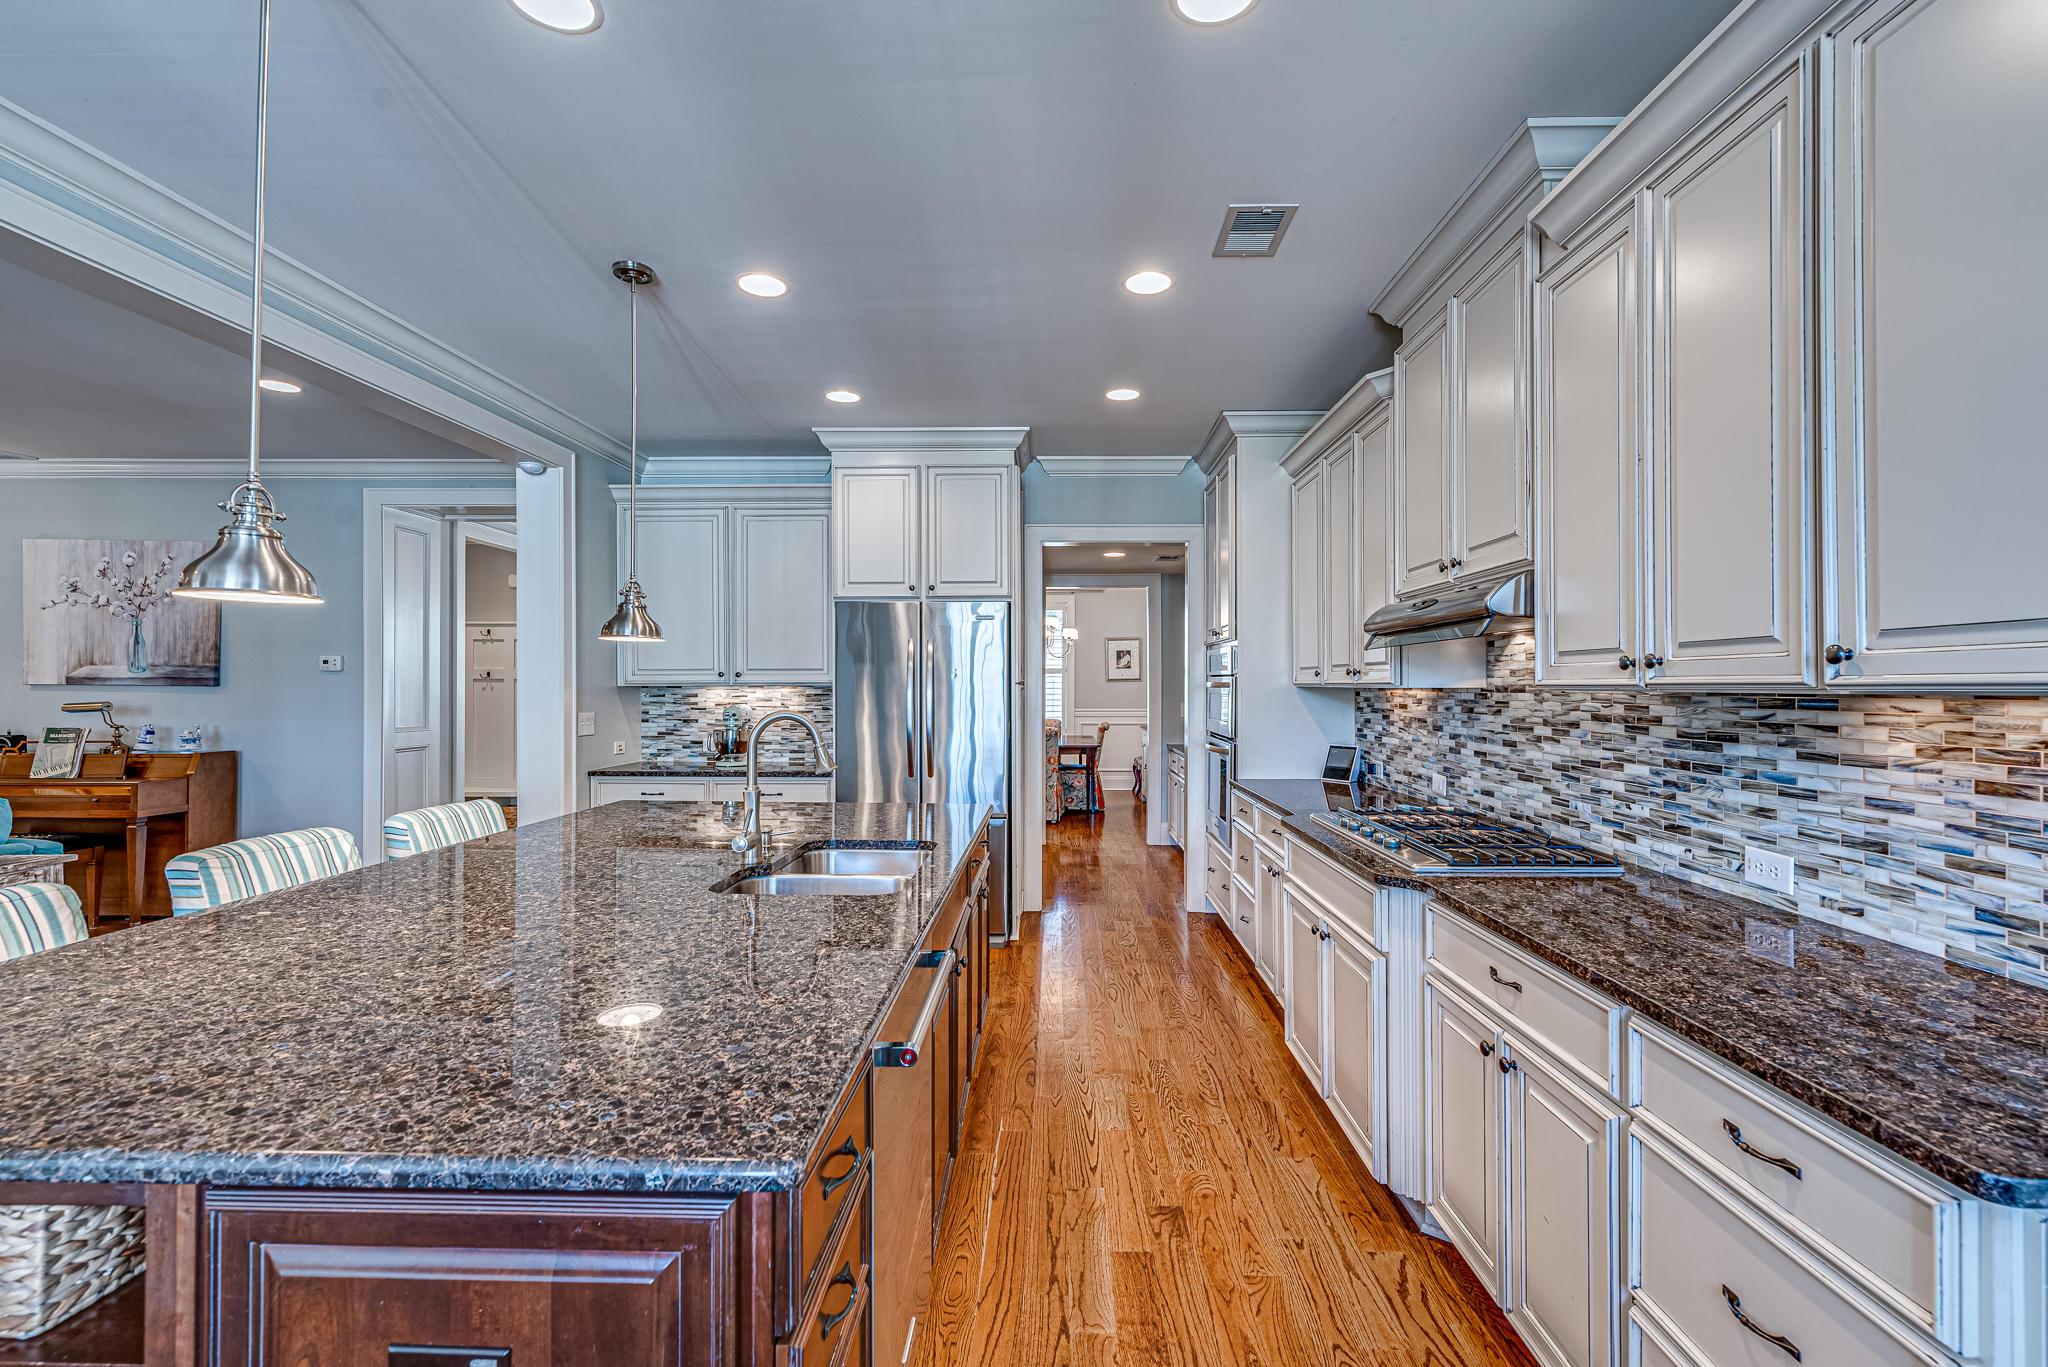 Daniel Island Smythe Park Homes For Sale - 1410 Wando View, Charleston, SC - 23